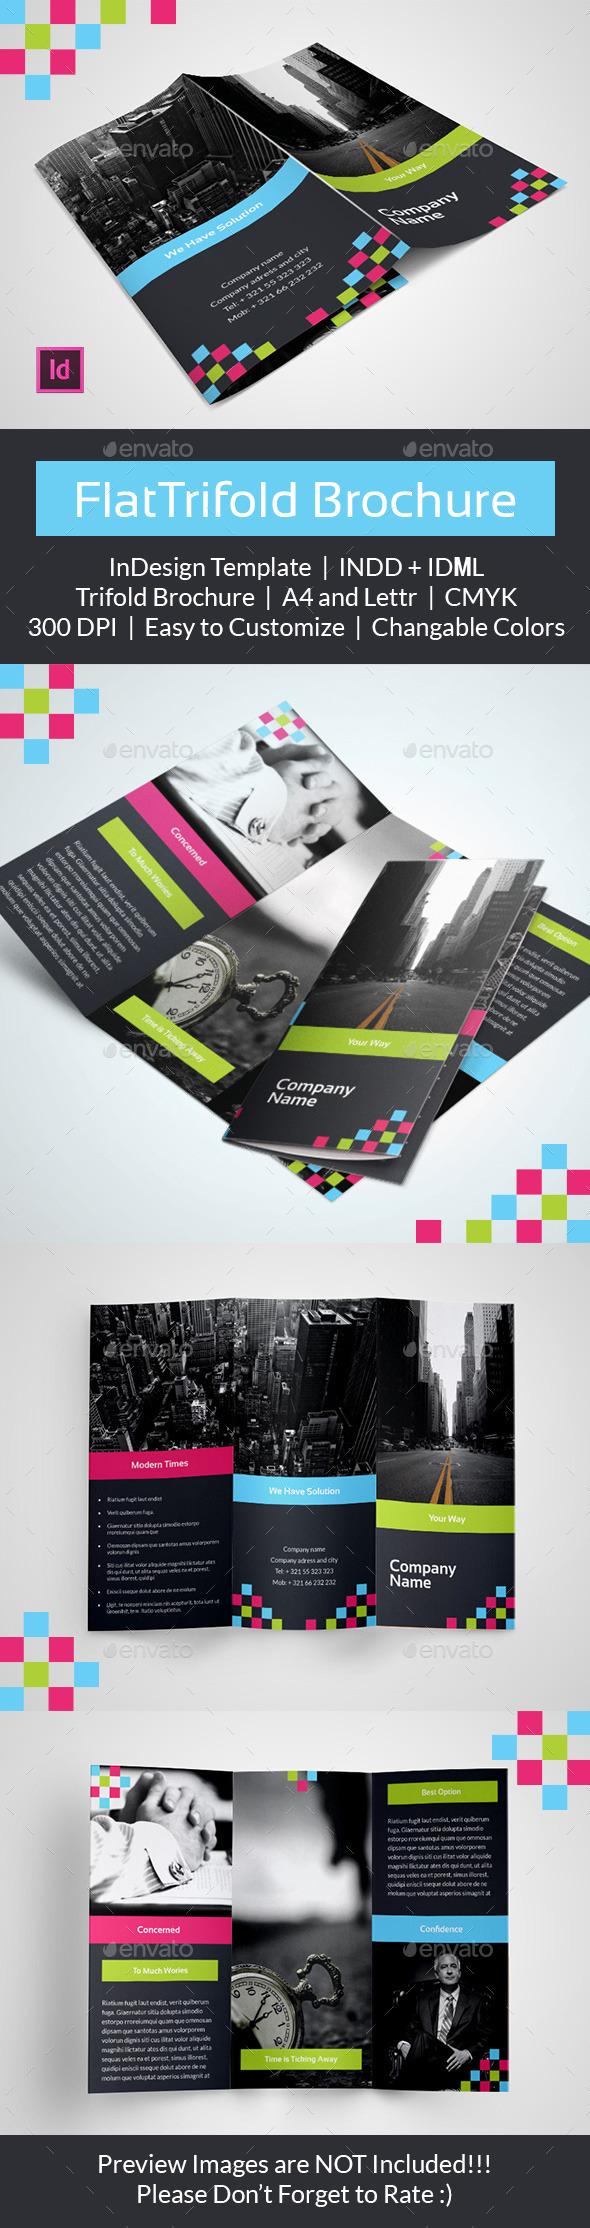 Flat Tri Fold Brochure Template - Brochures Print Templates